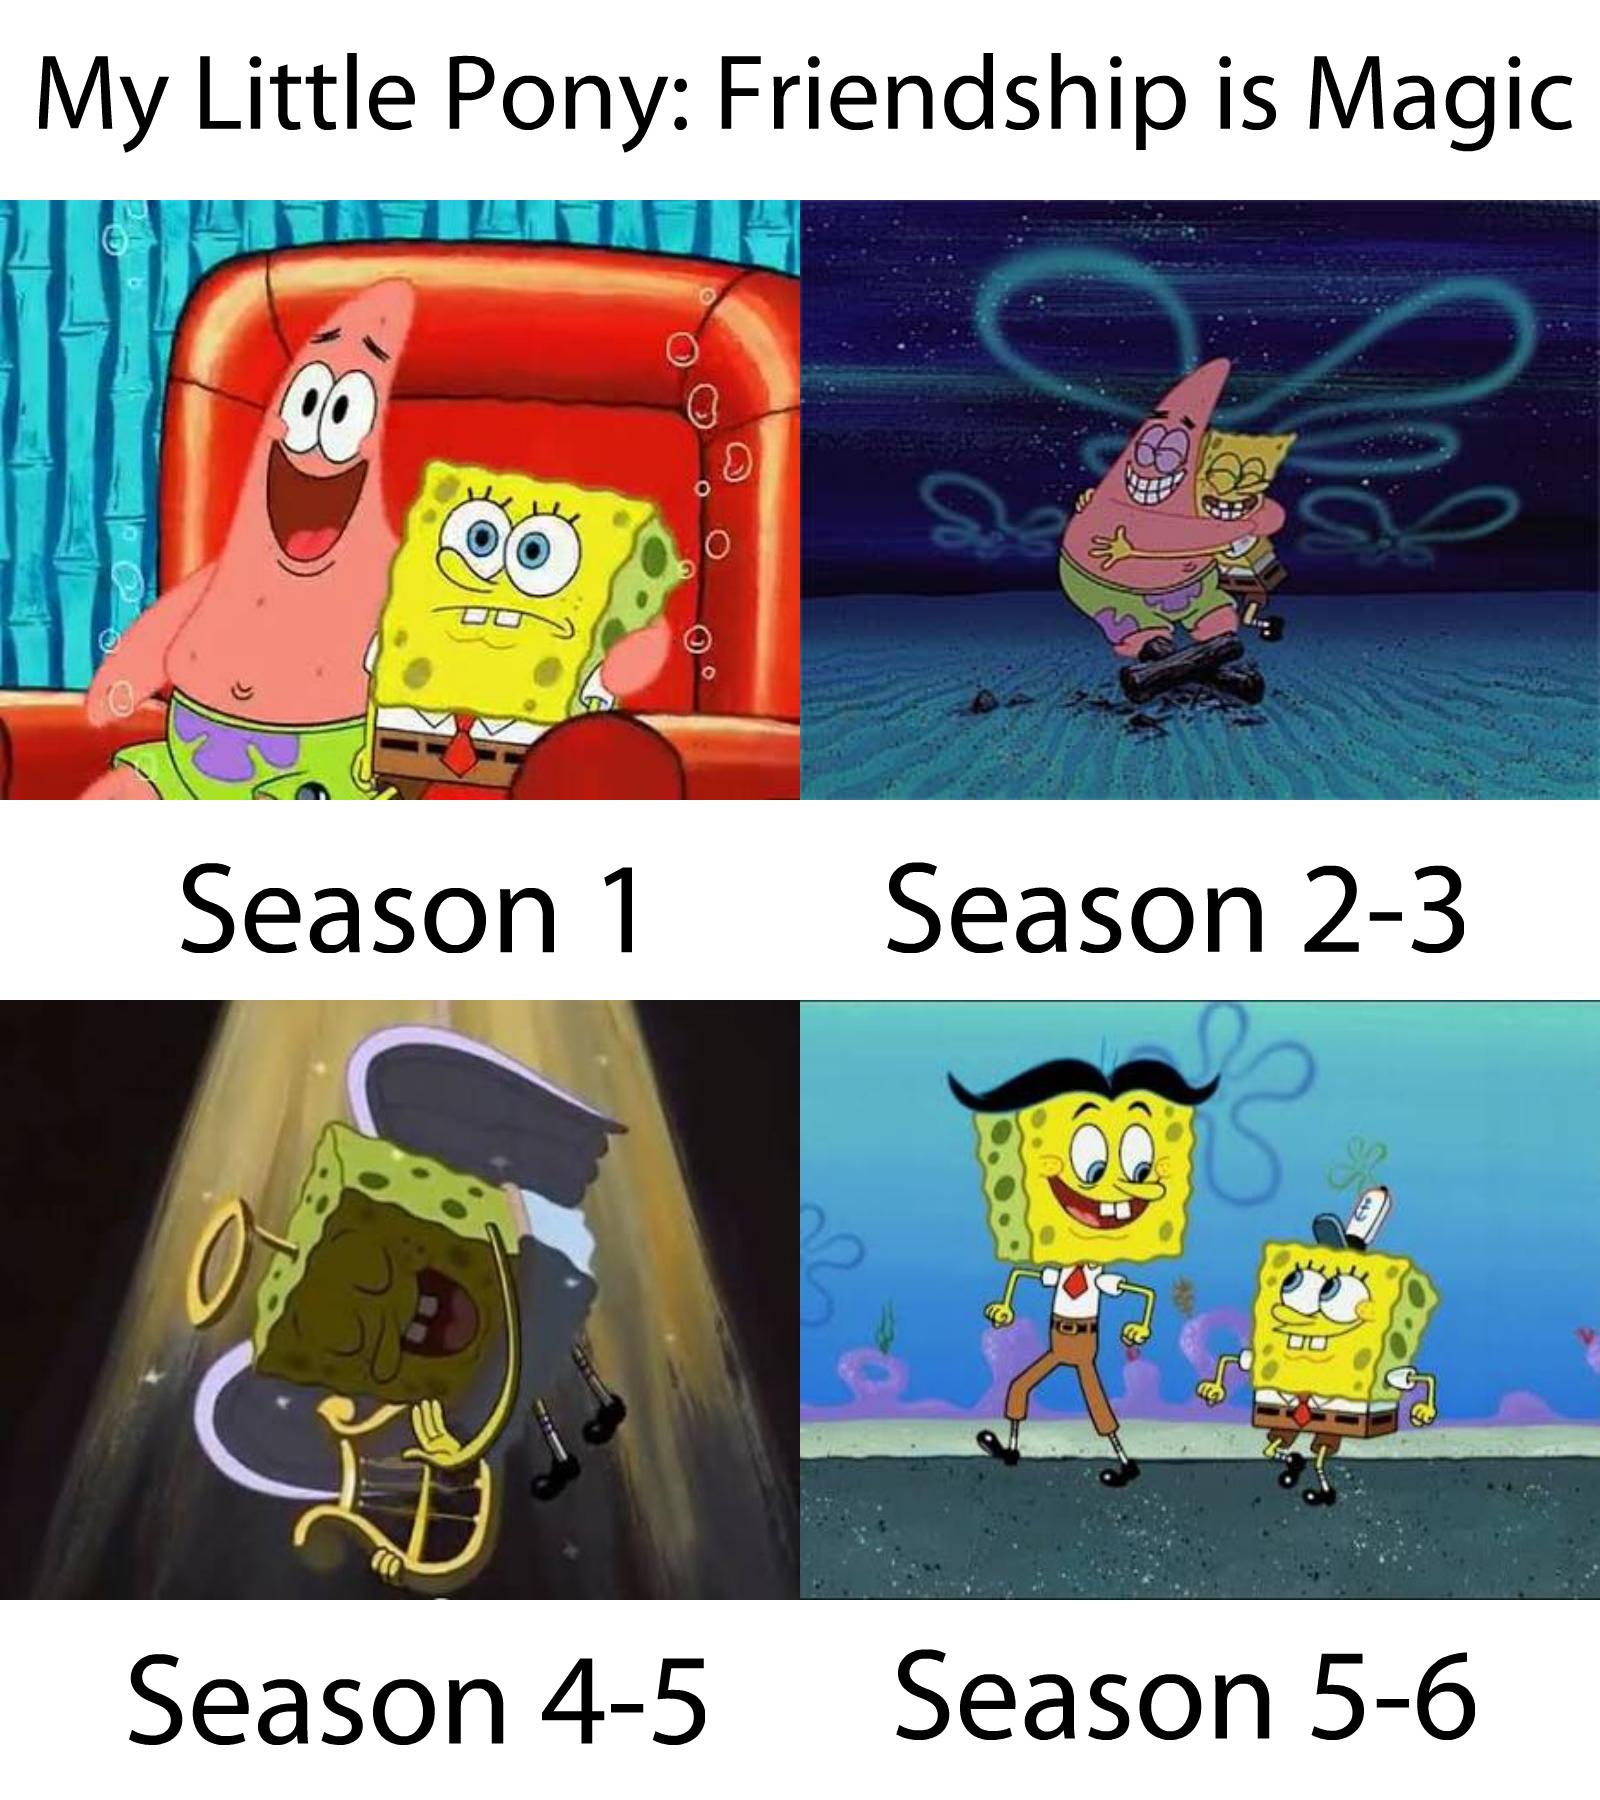 My little pony friendship is magic season season 2 3 season 4 5